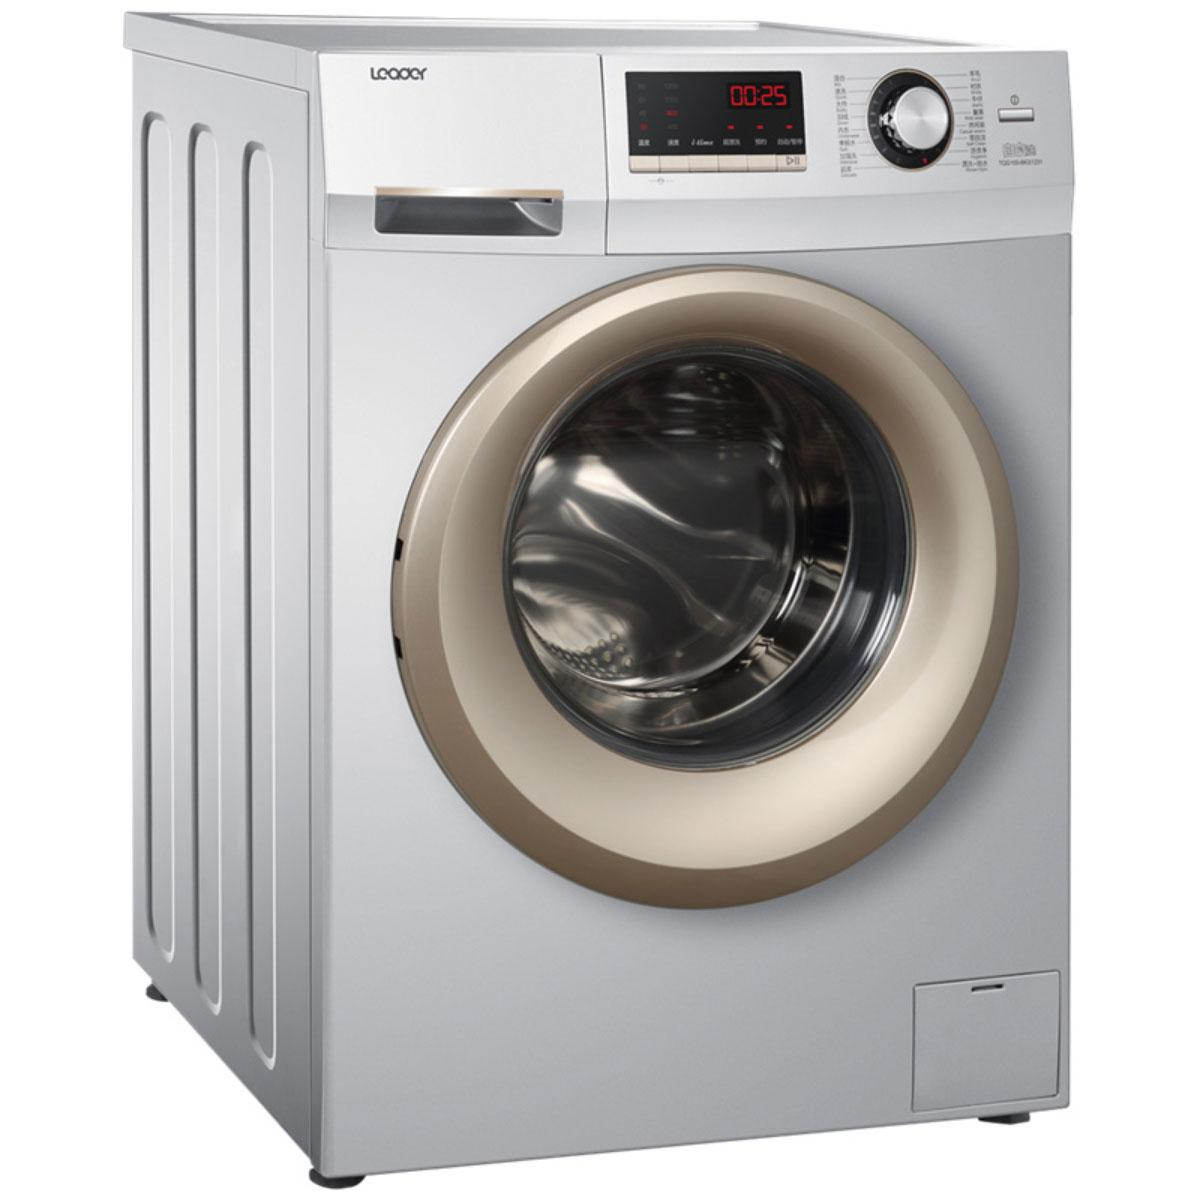 Leader/统帅                         滚筒洗衣机                         TQG70-BKX1031G